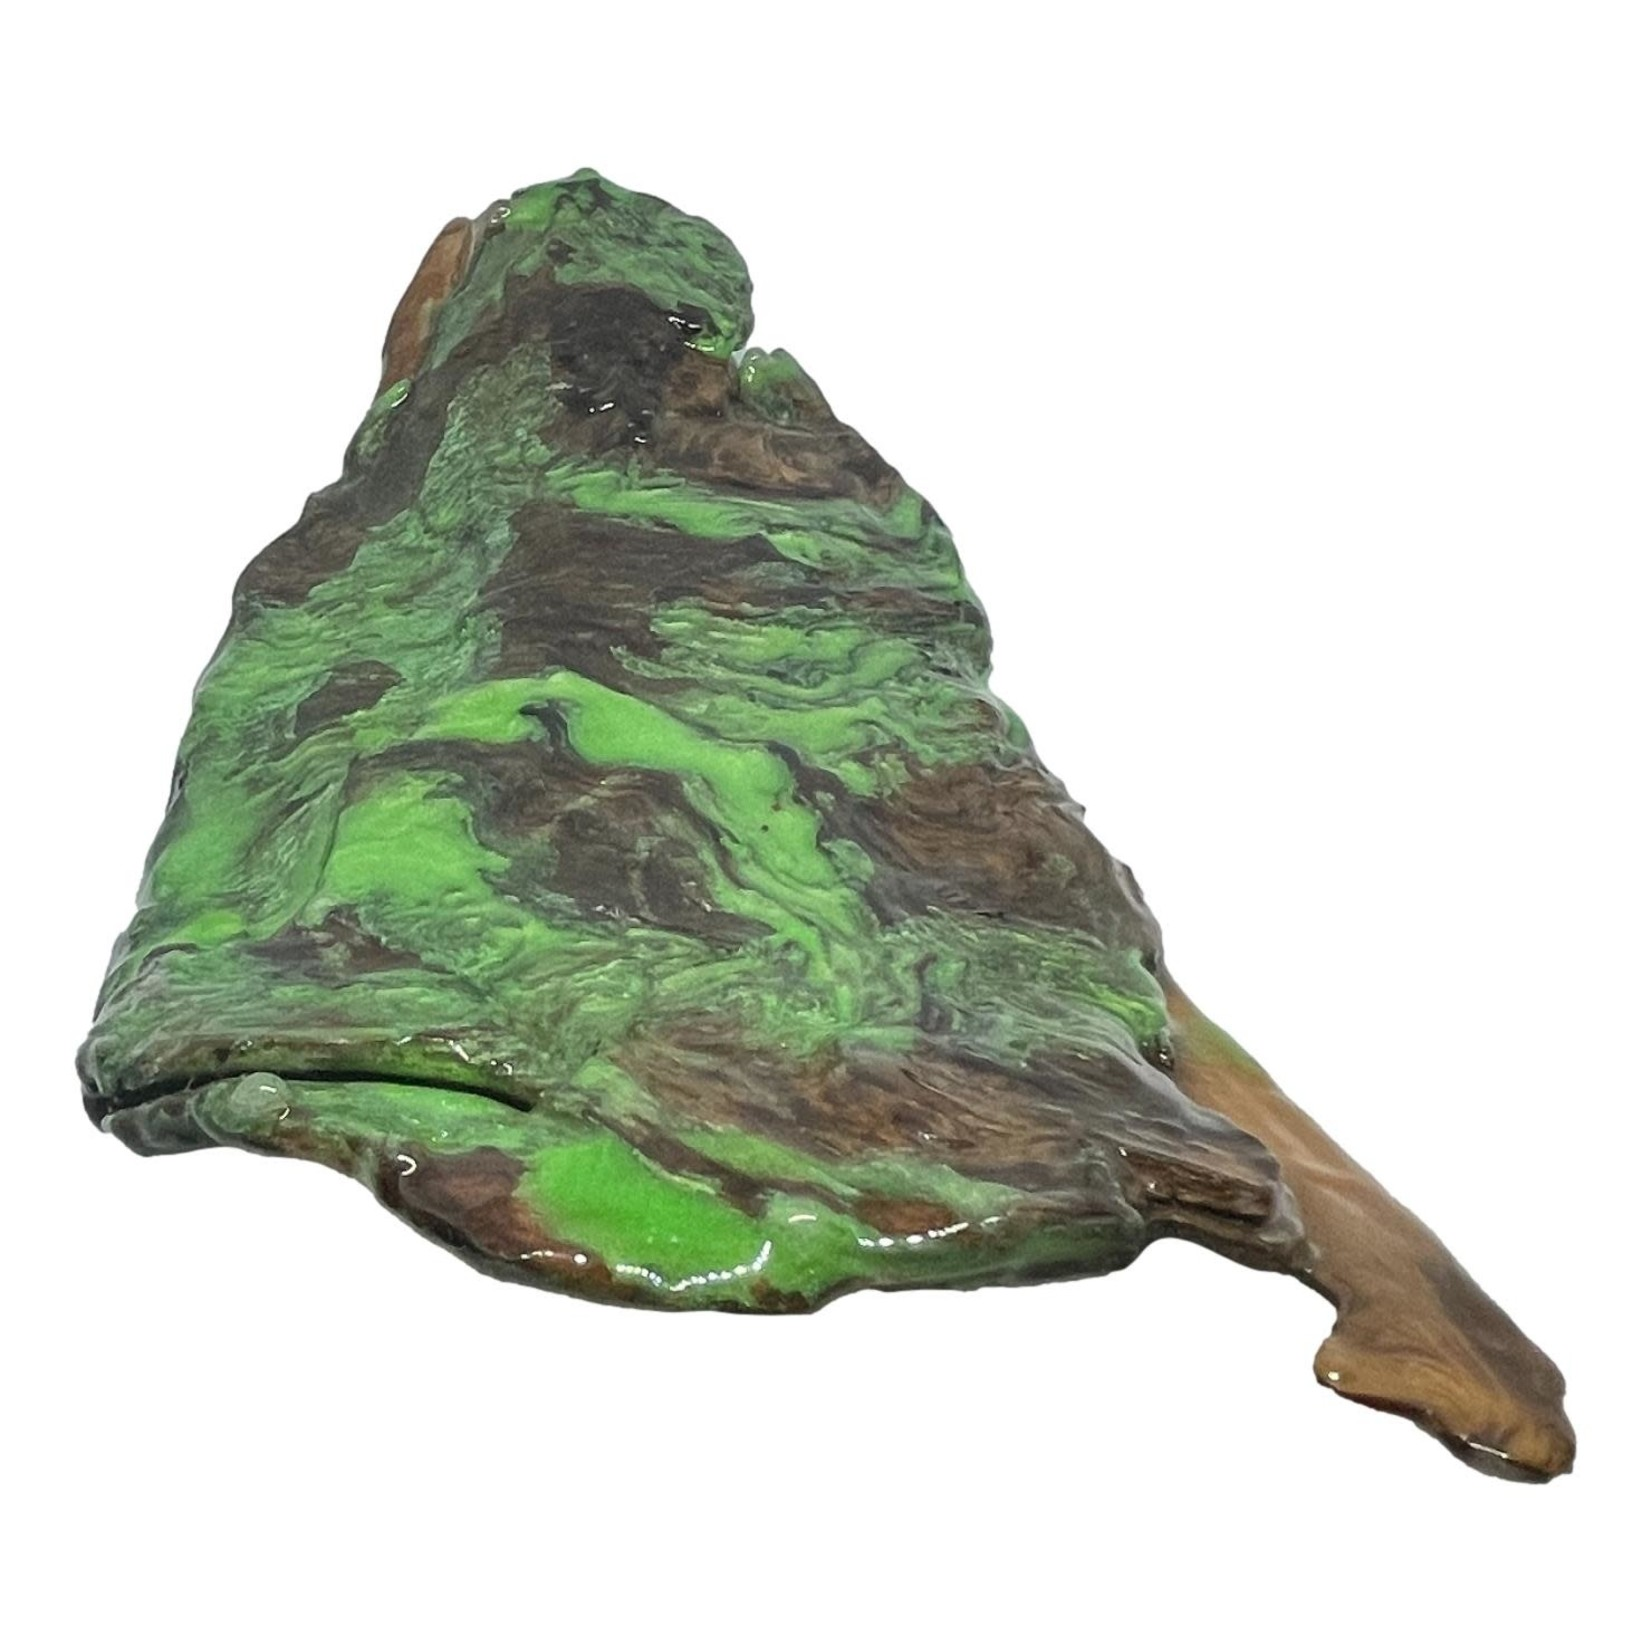 East Coast Sirens Green Driftwood Decor Piece